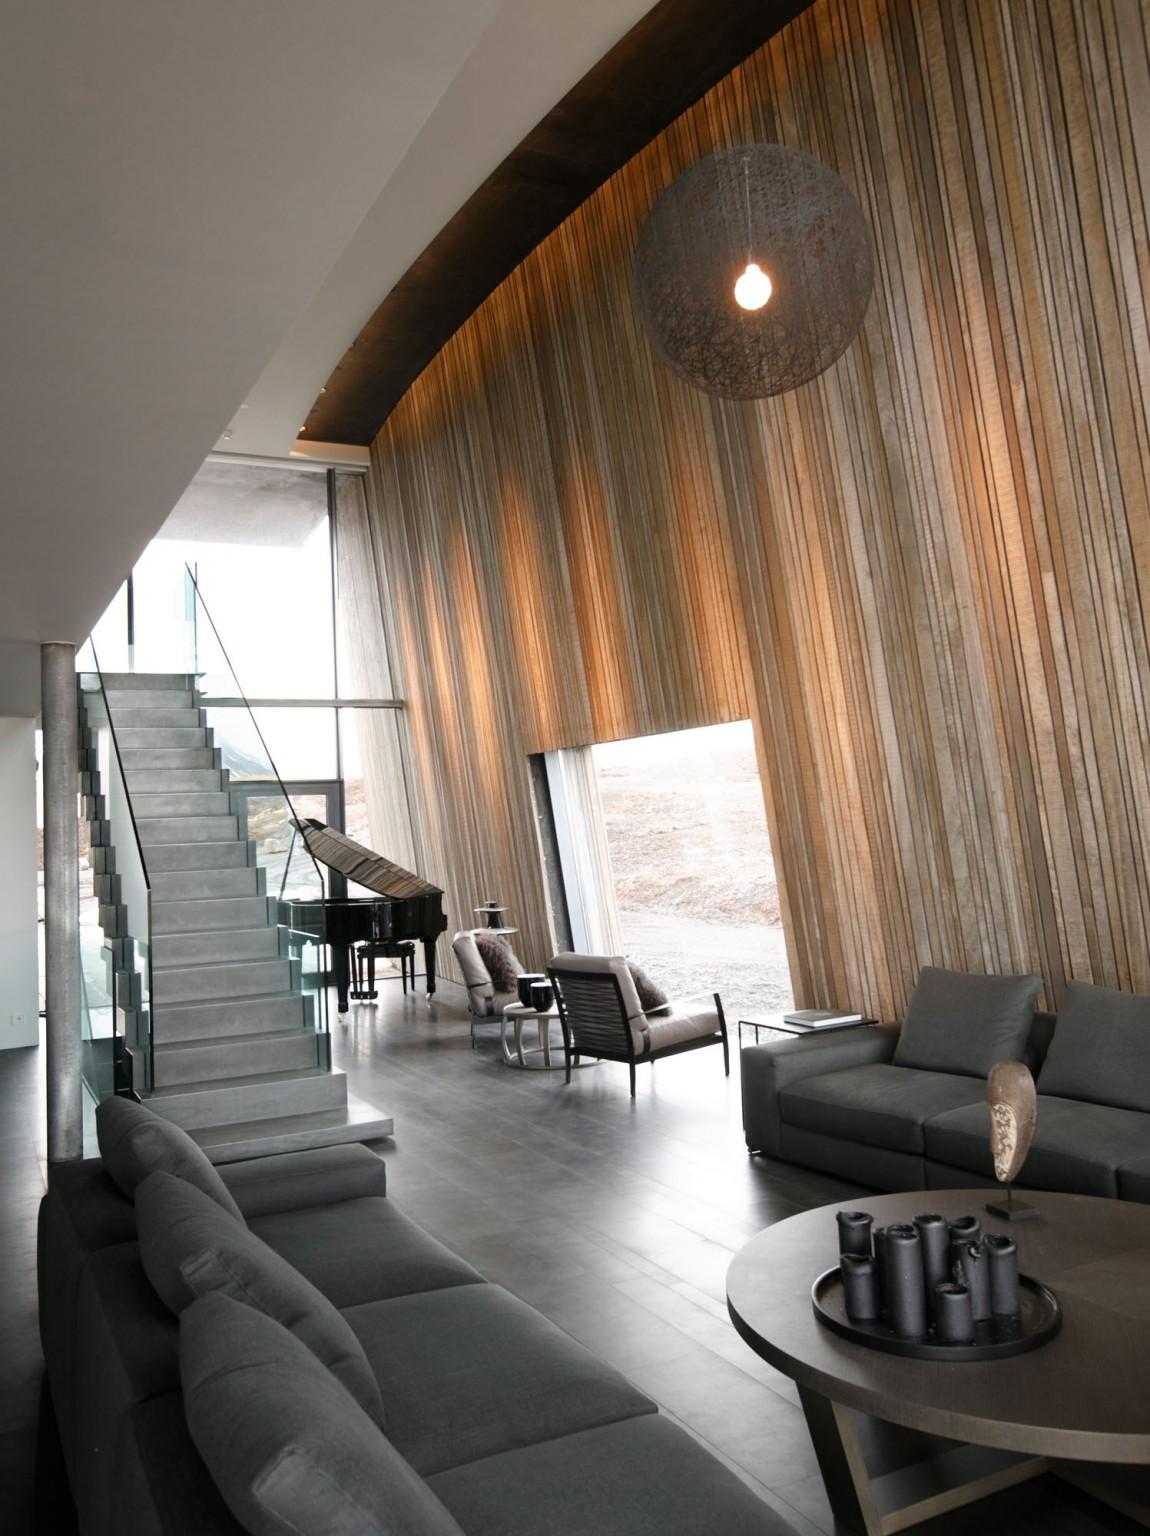 Gudmundur Jonnson Architects